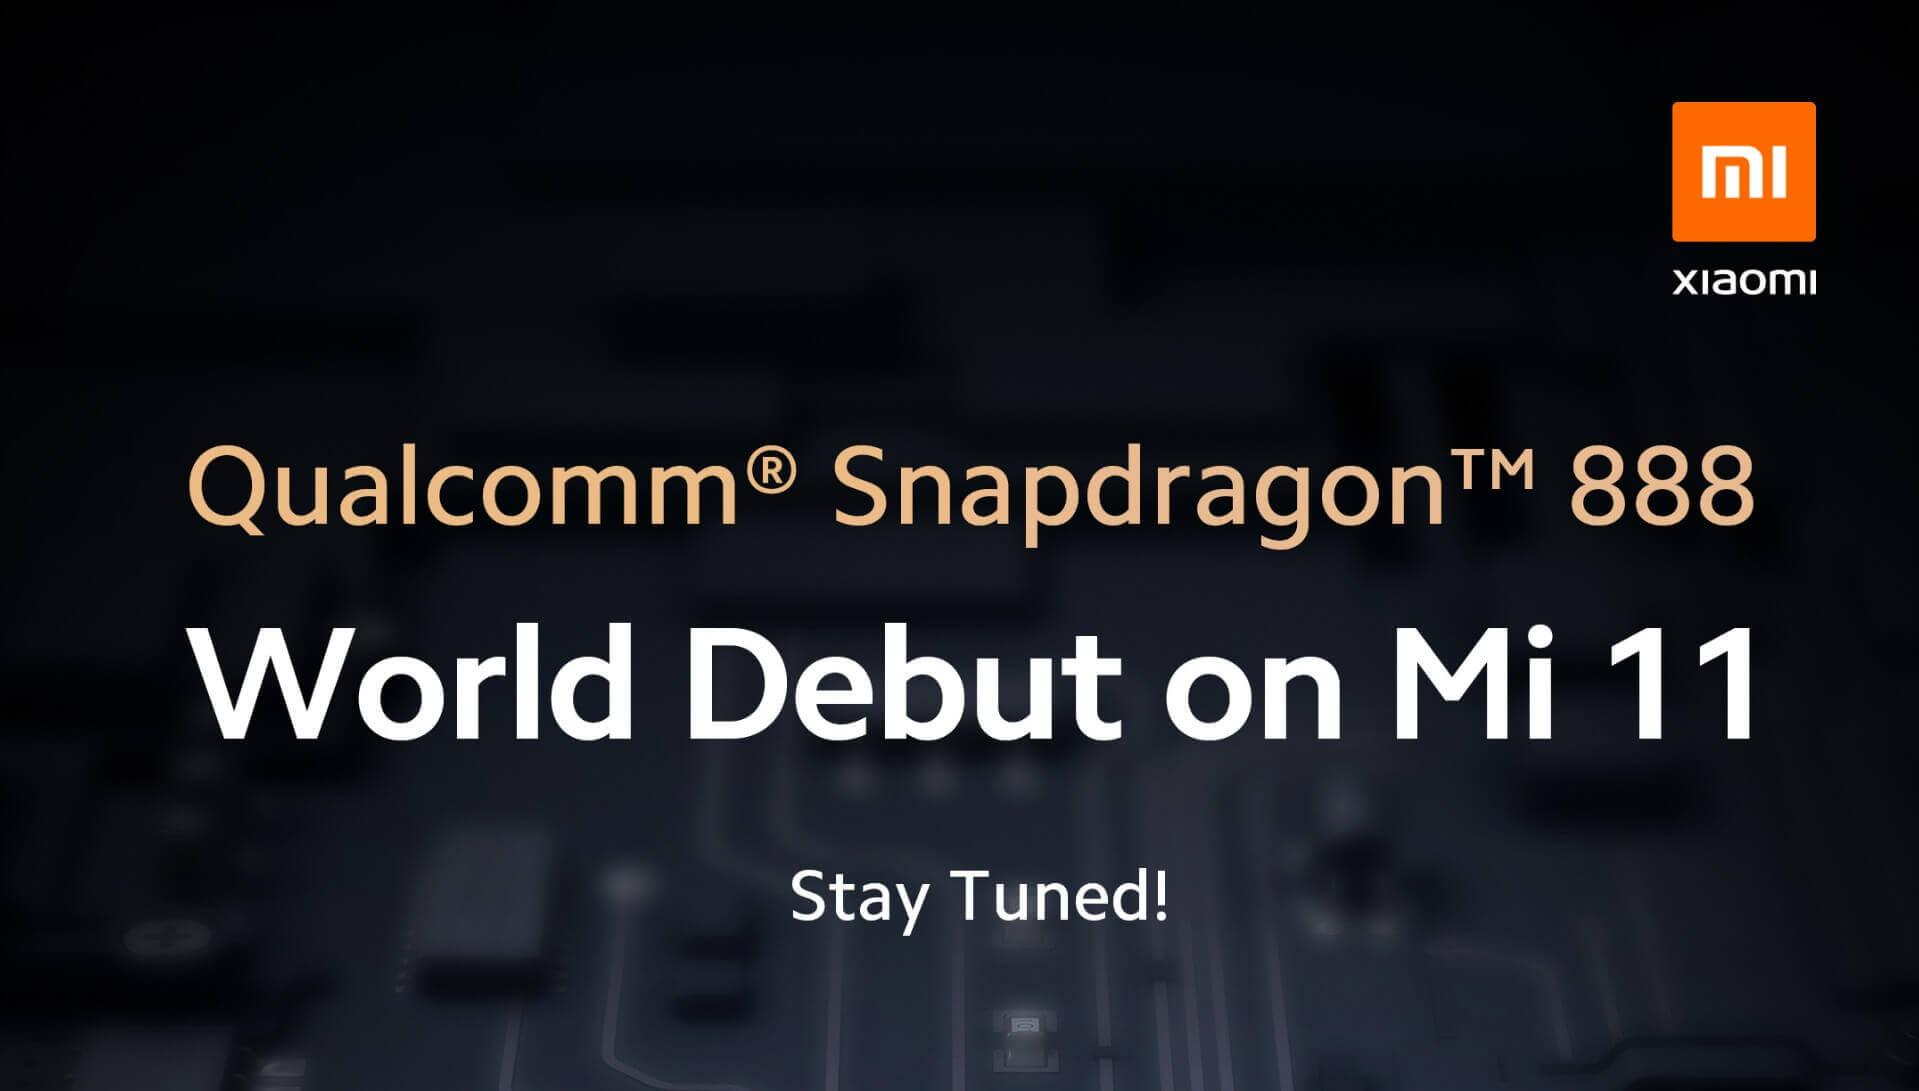 Xiaomi เผยเตรียมเปิดตัว Mi 11 ซีรีส์ที่มาพร้อม Snapdragon 888 มกราคมนี้